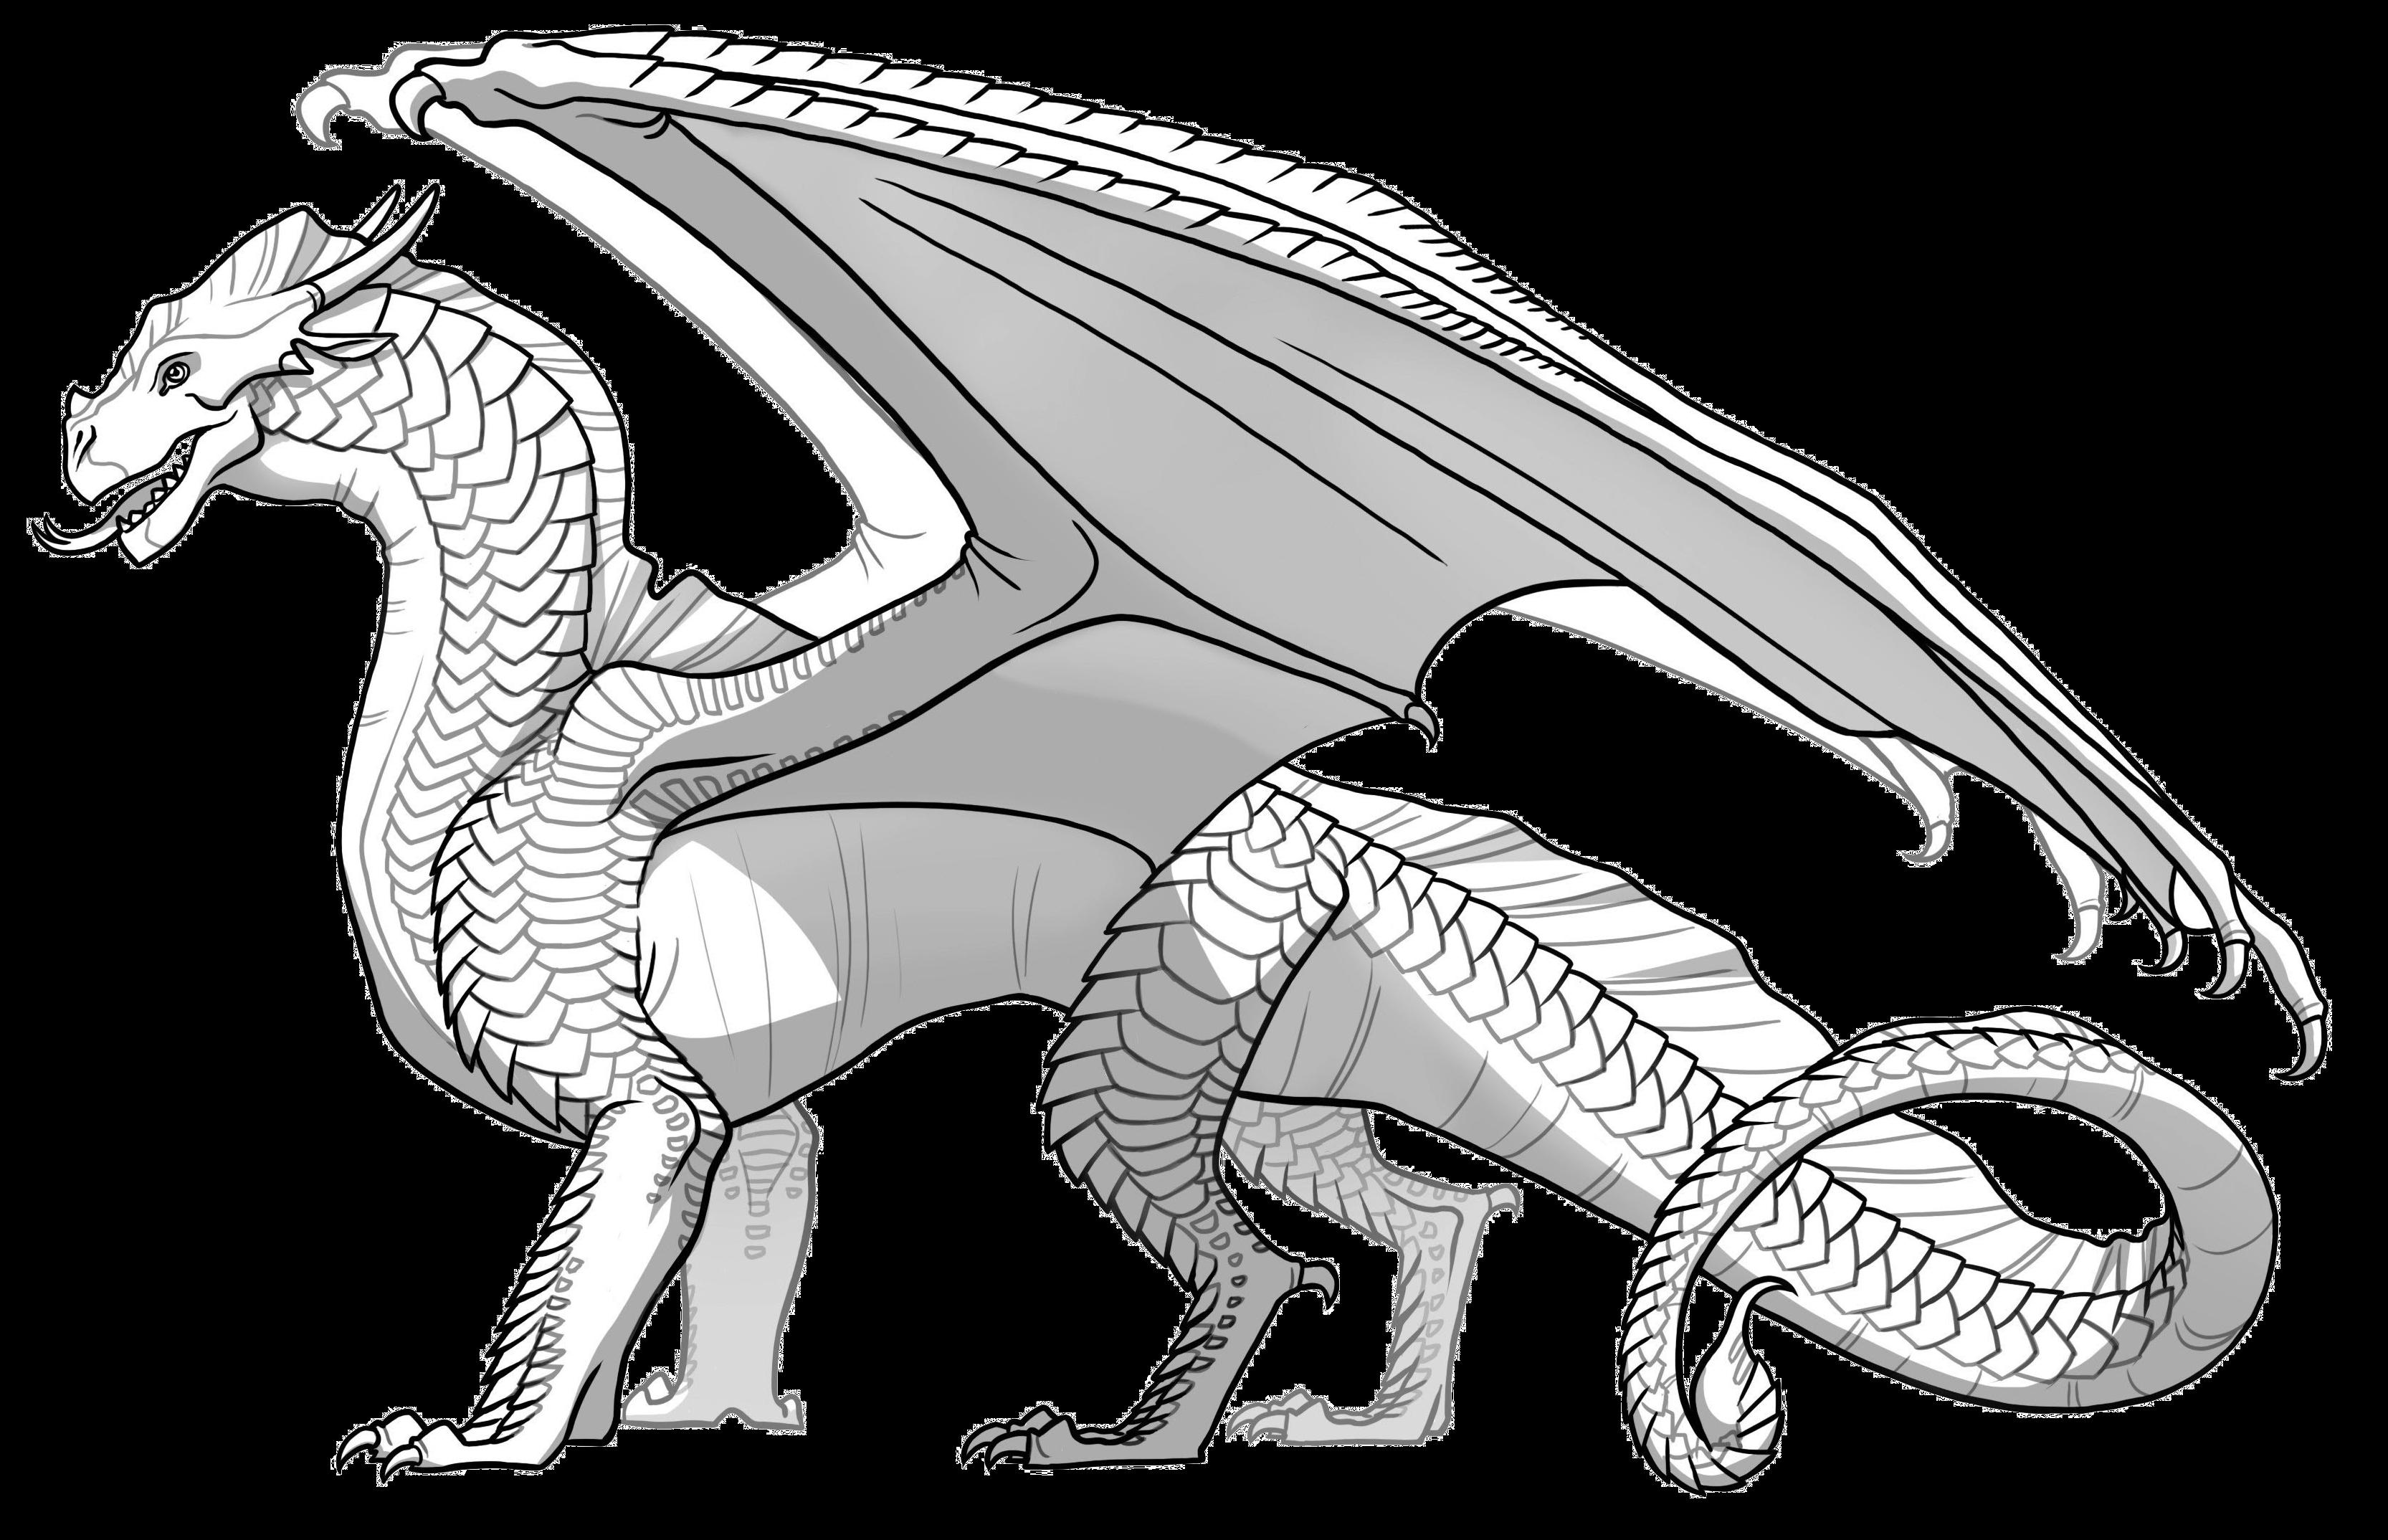 Wings Of Fire Coloring Pages Sandwings  Wings Of Fire Wiki  Fandom Poweredwikia